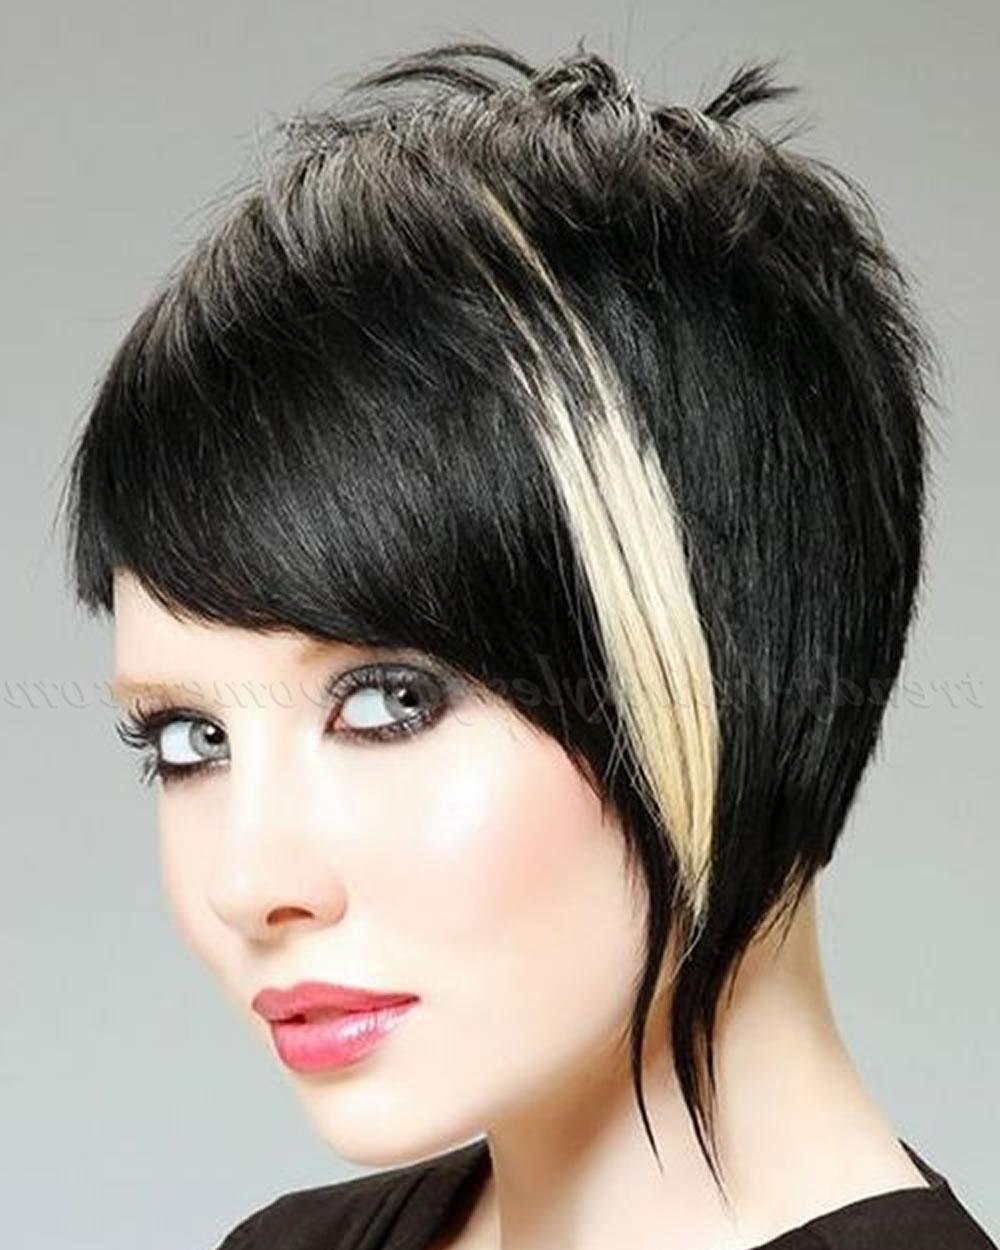 Asymmetrical Short Hair 2018 – 33 Haute Short Hairstyles & Haircuts Inside Asymmetrical Short Hairstyles (Gallery 5 of 25)